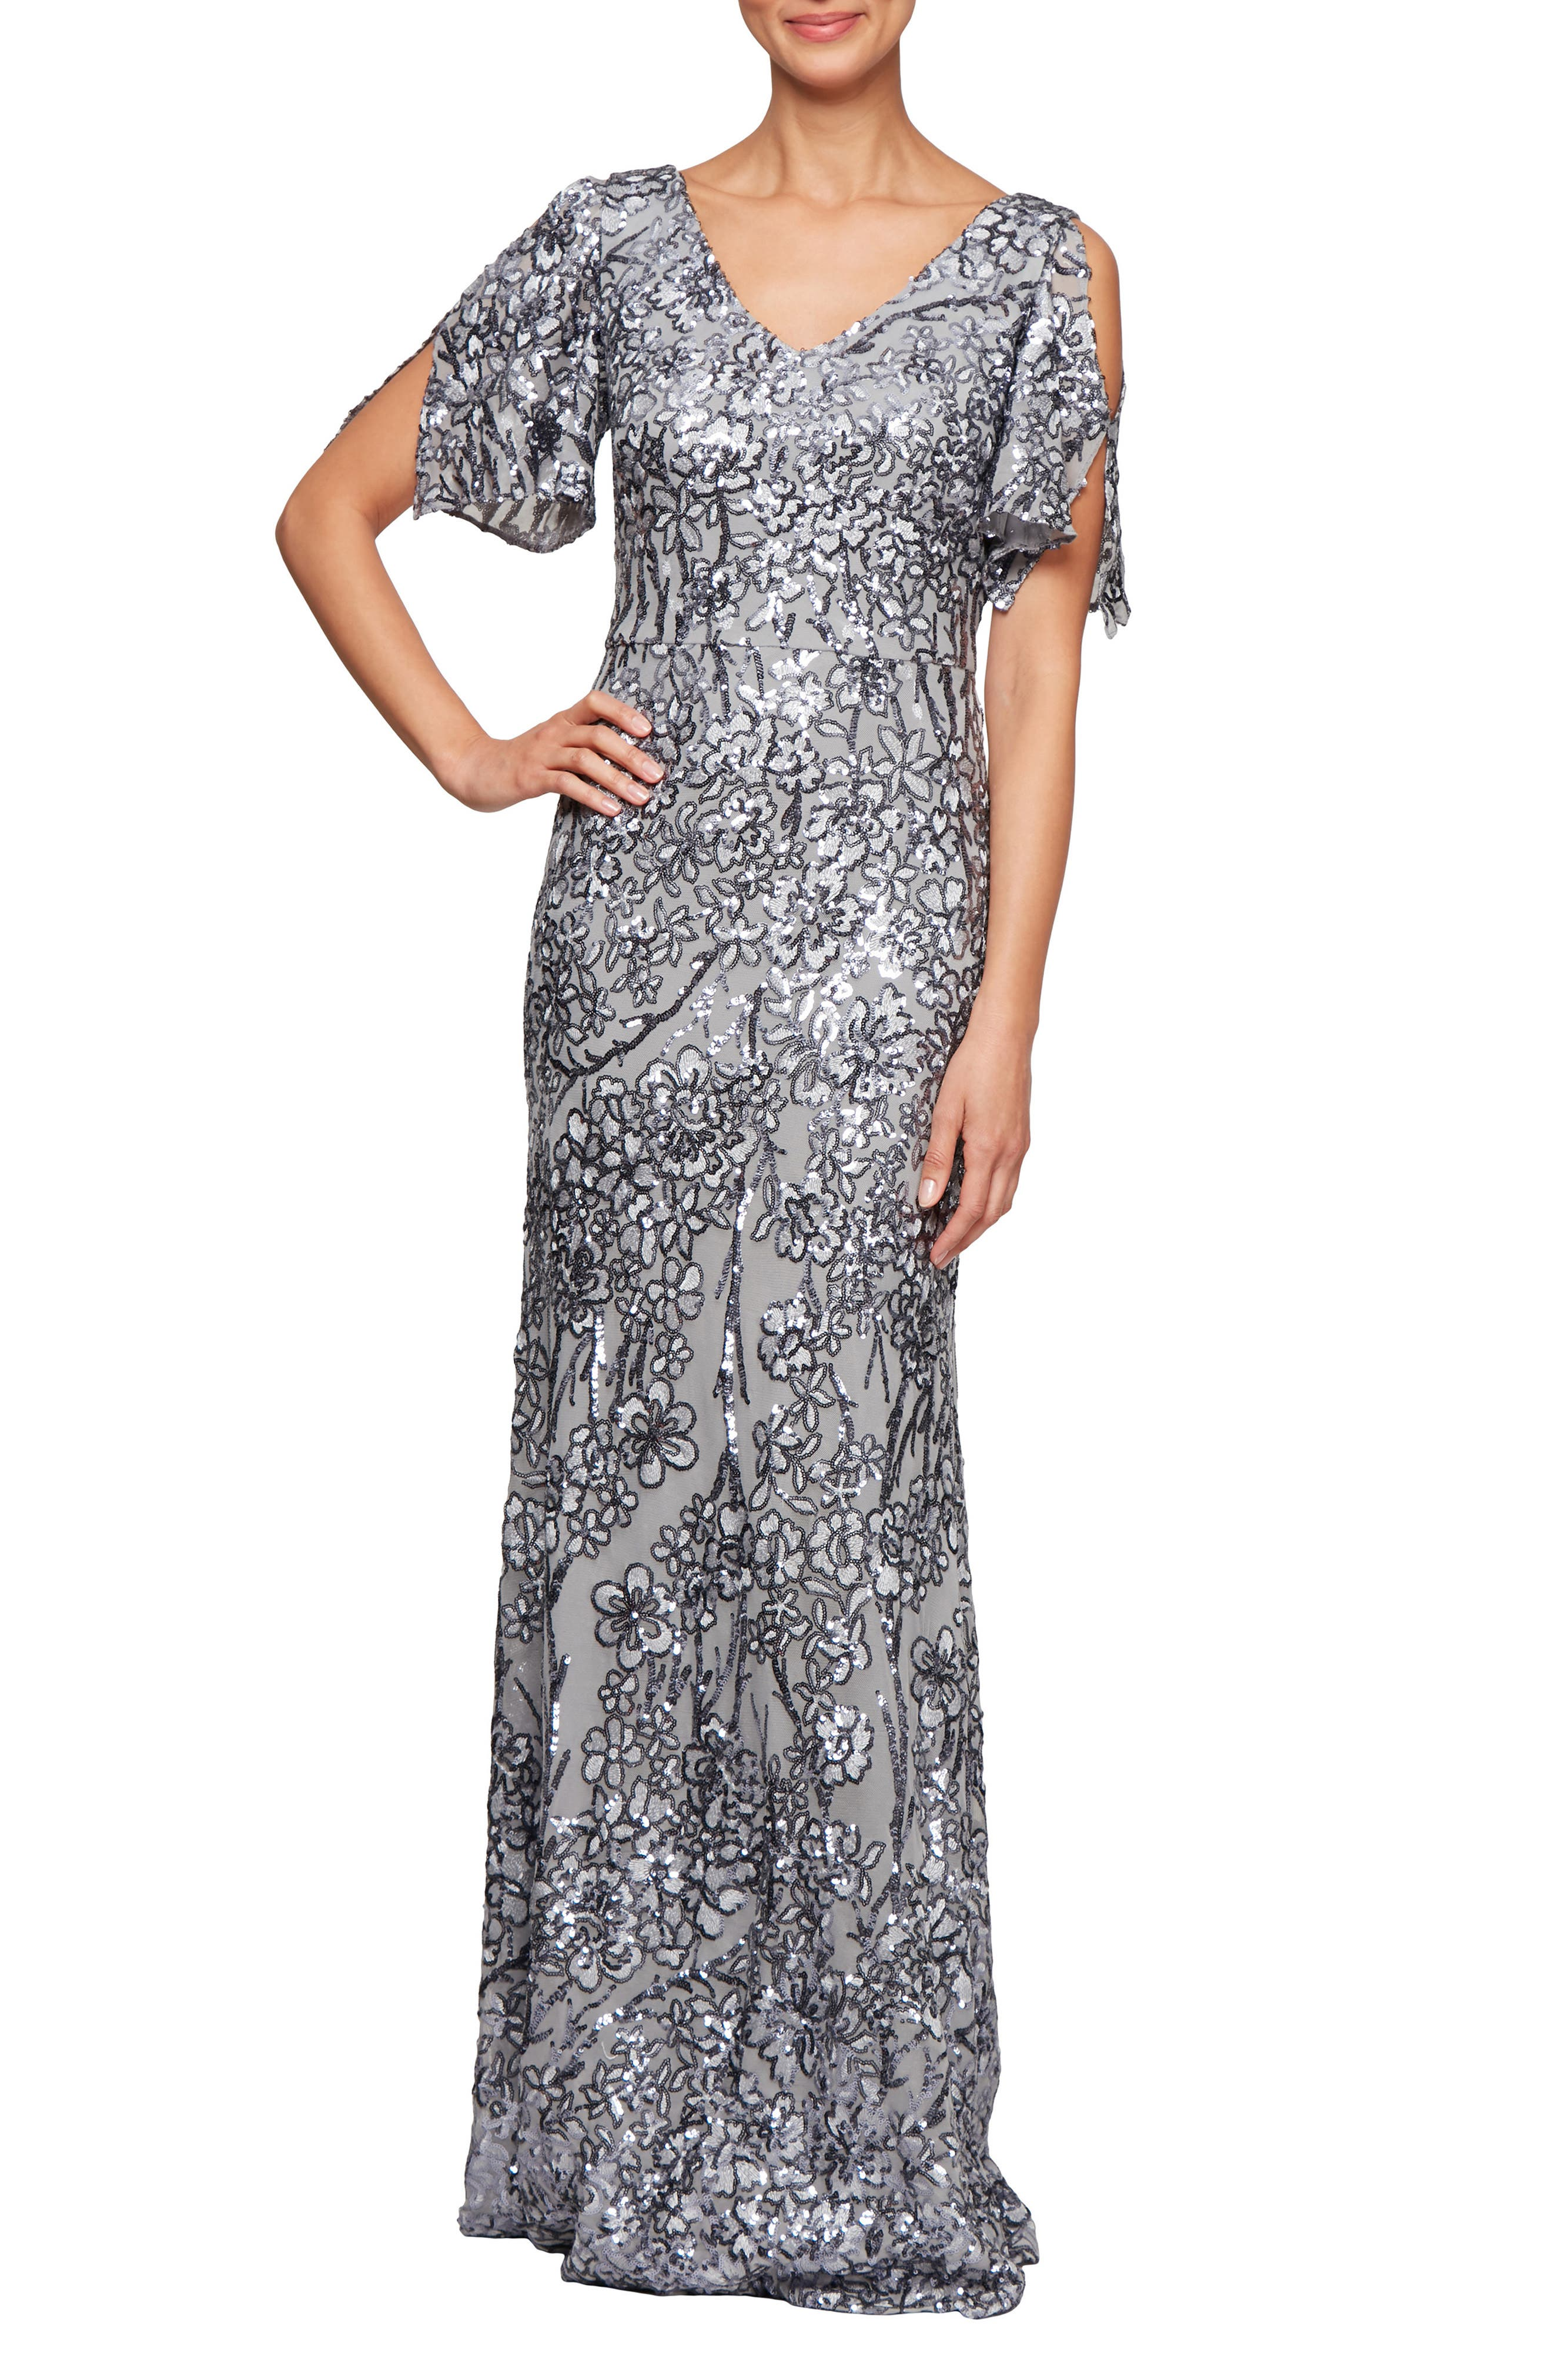 Great Gatsby Dress – Great Gatsby Dresses for Sale Petite Womens Alex Evenings Sequin Lace Cold Shoulder Trumpet Gown Size 16P - Metallic $239.00 AT vintagedancer.com